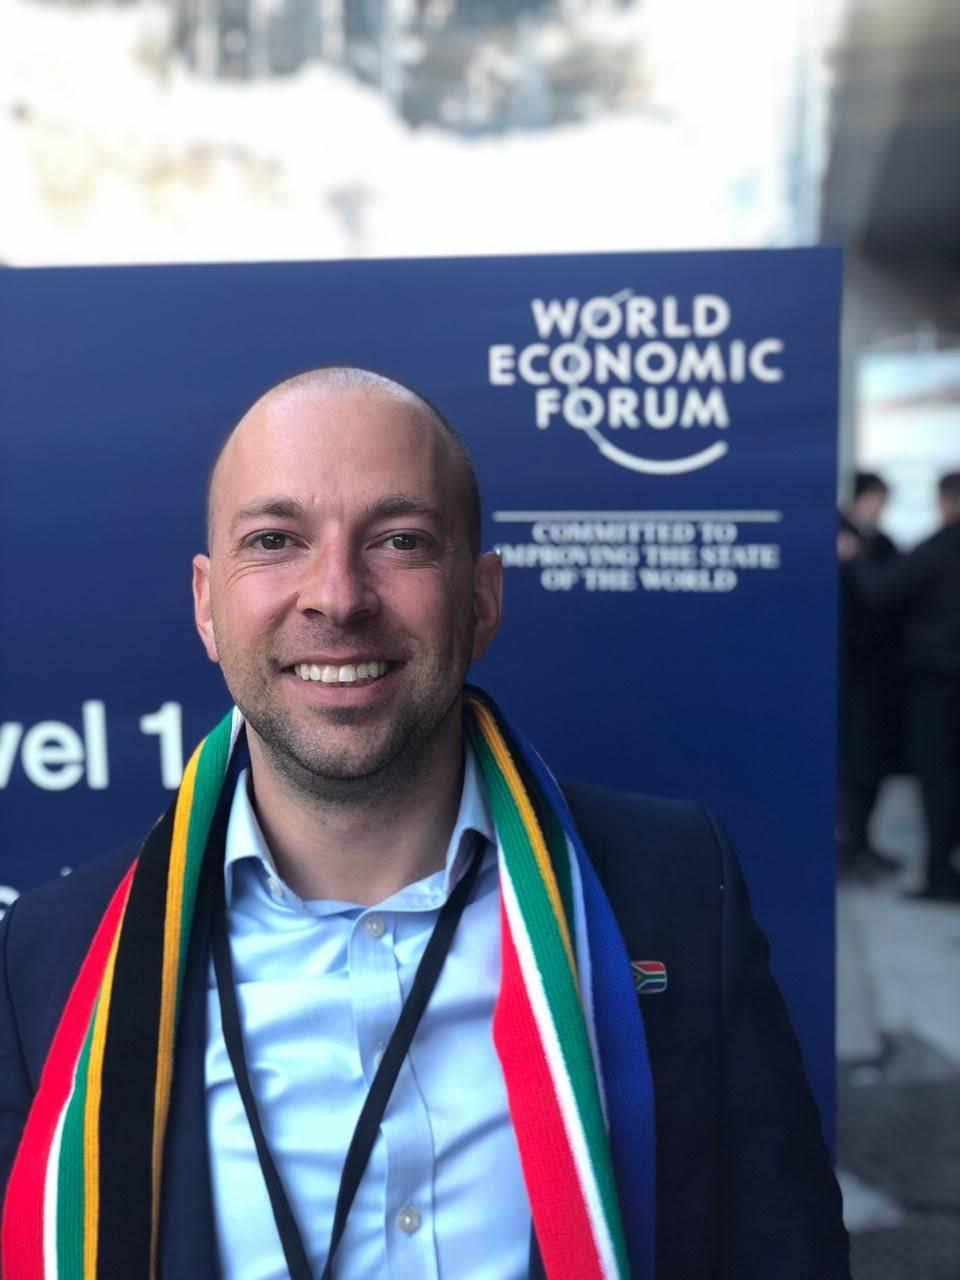 Daniel Avinir